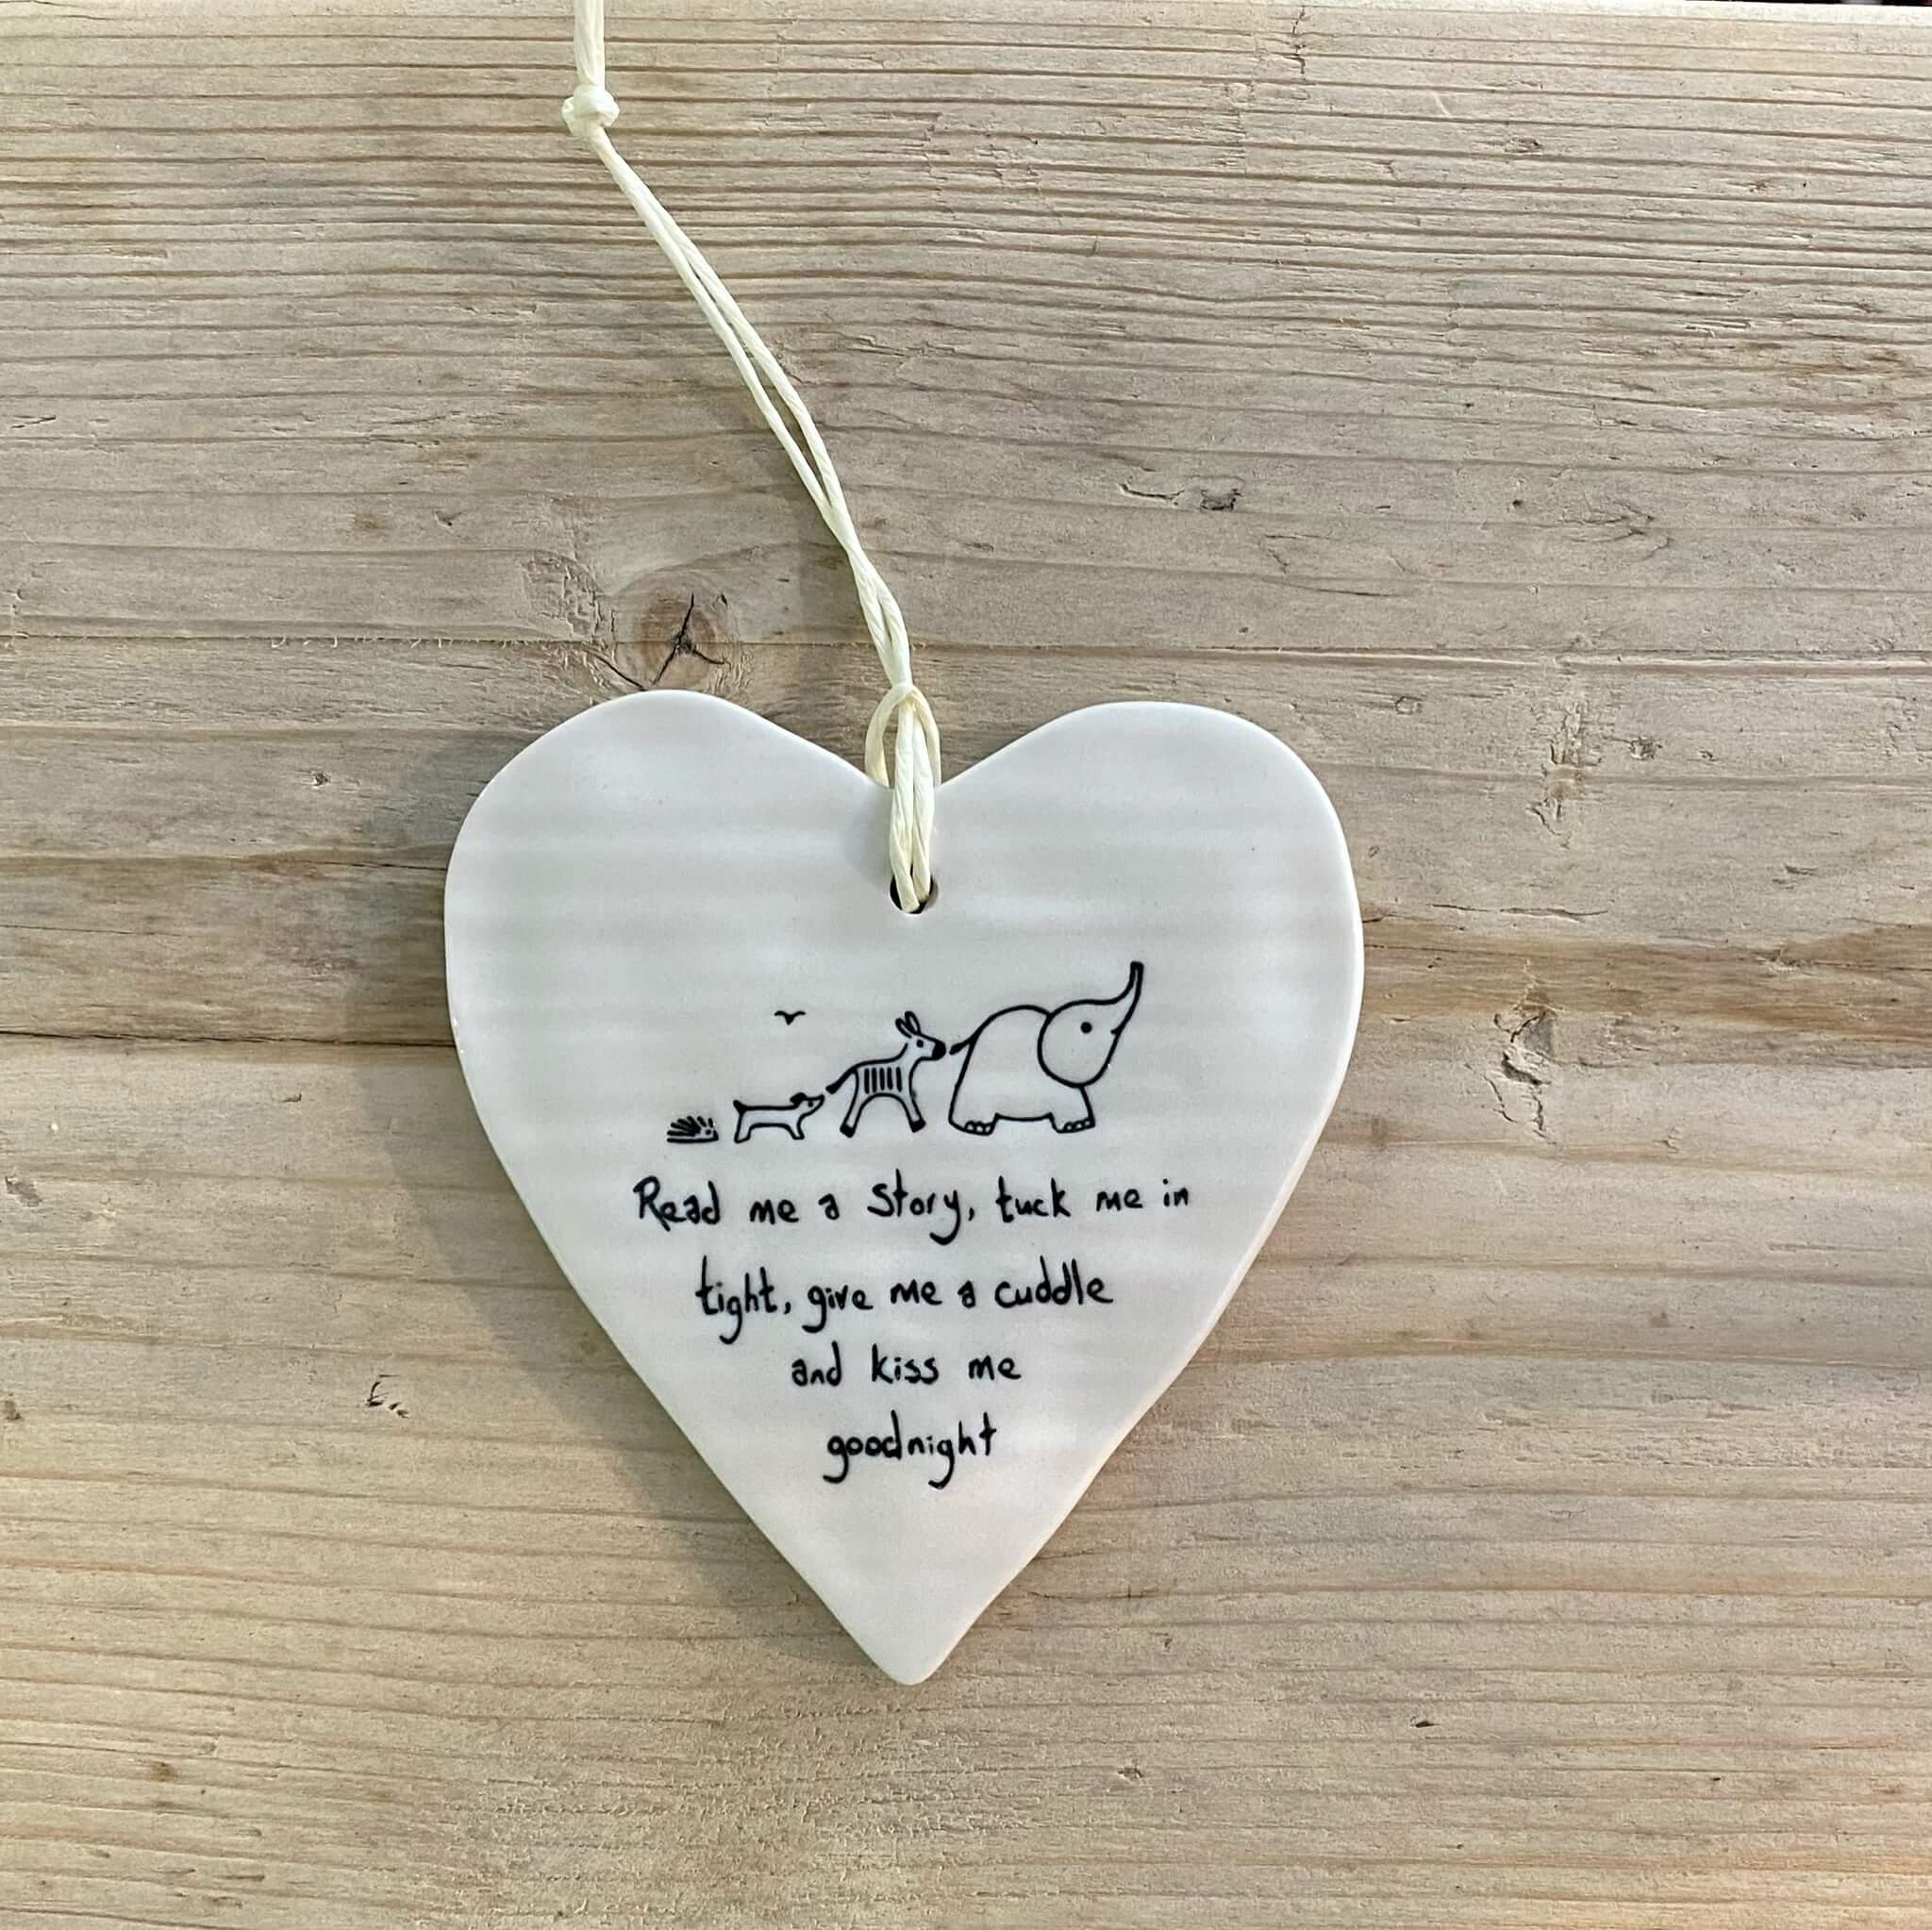 Porcelain Heart - Read me a story